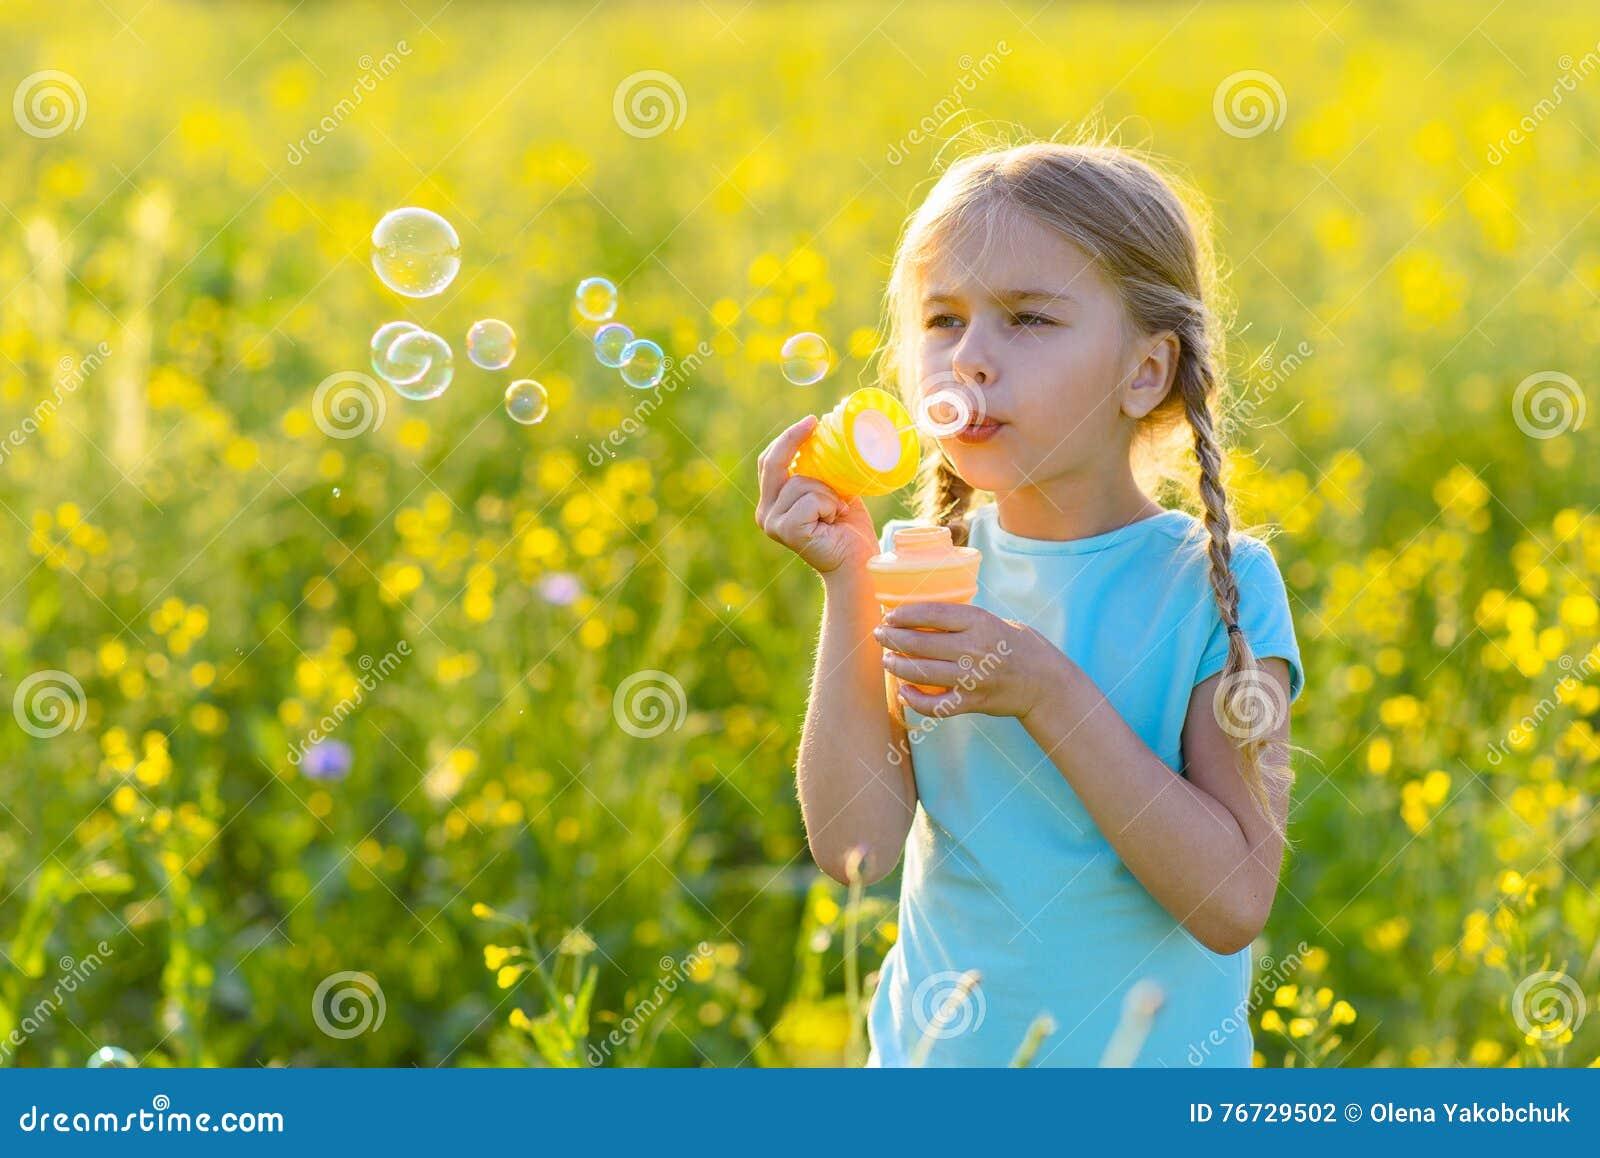 Little girl enjoying weekend outdoors